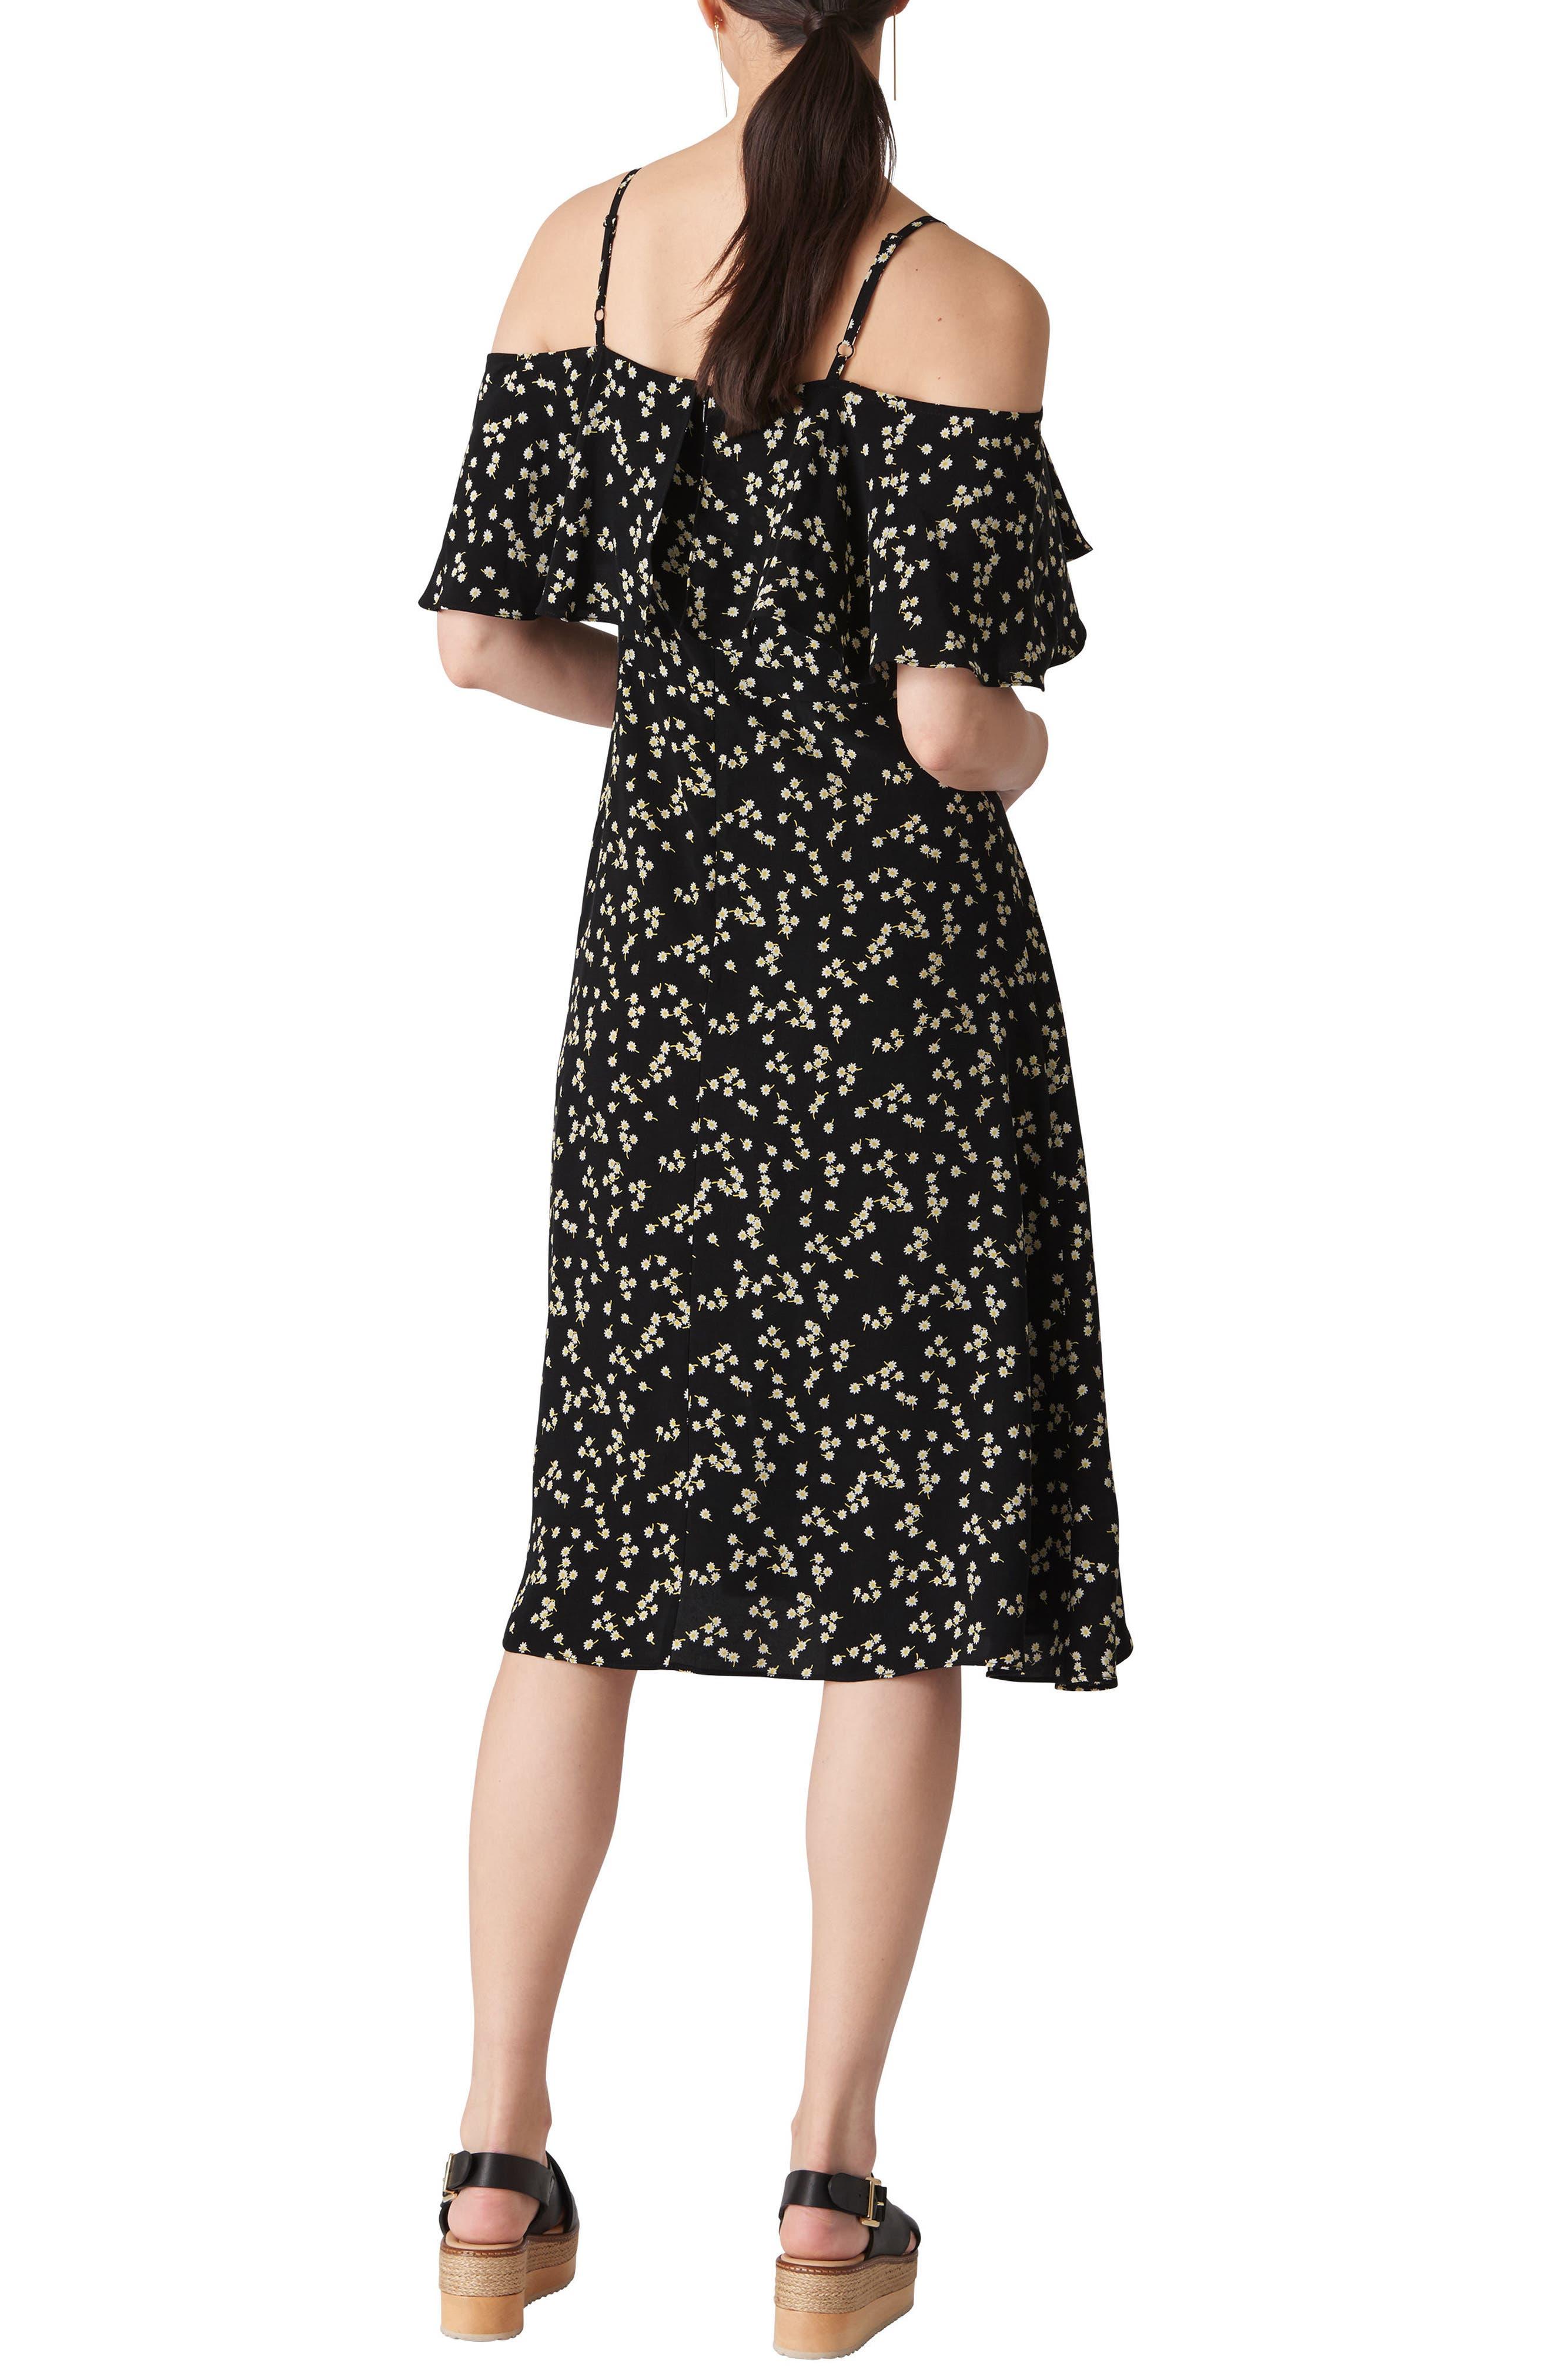 WHISTLES,                             Frill Cold Shoulder Dress,                             Alternate thumbnail 2, color,                             001